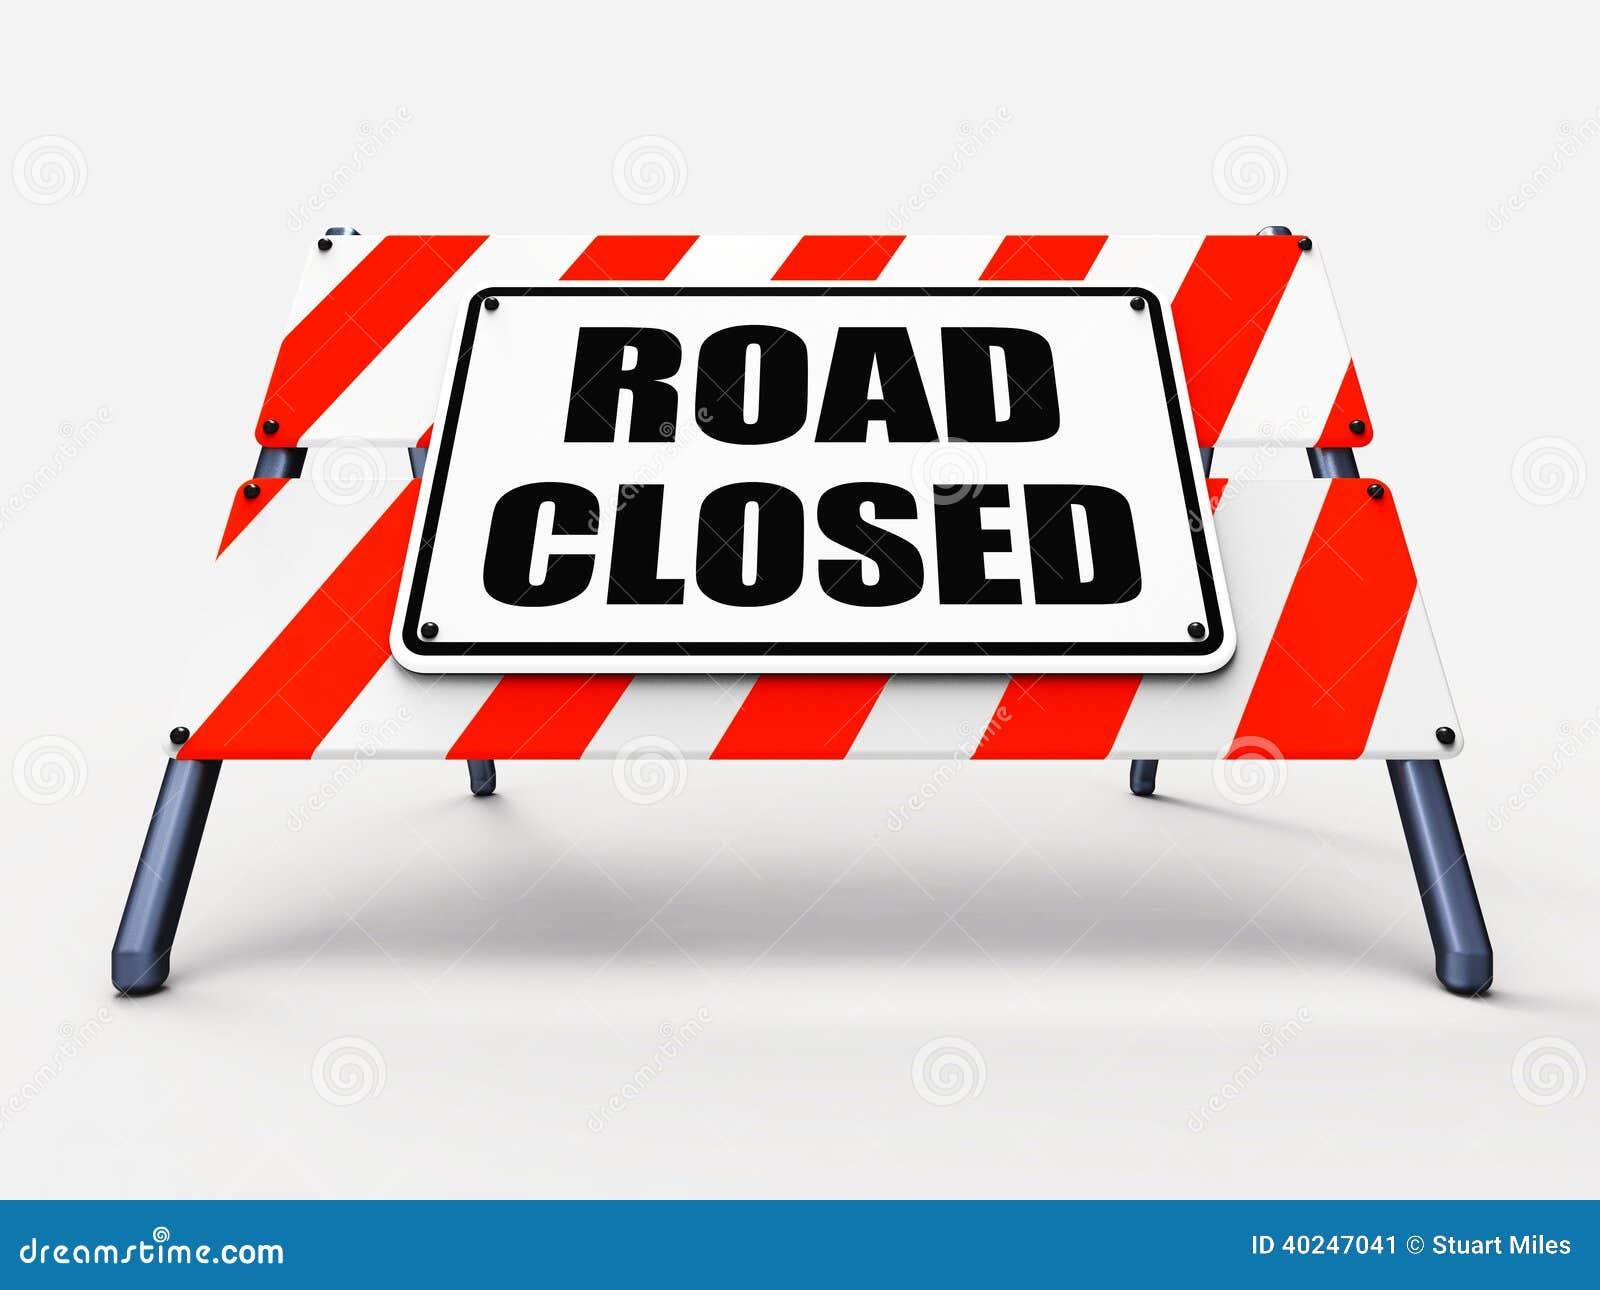 Road closed sign represents roadblock barrier or stock